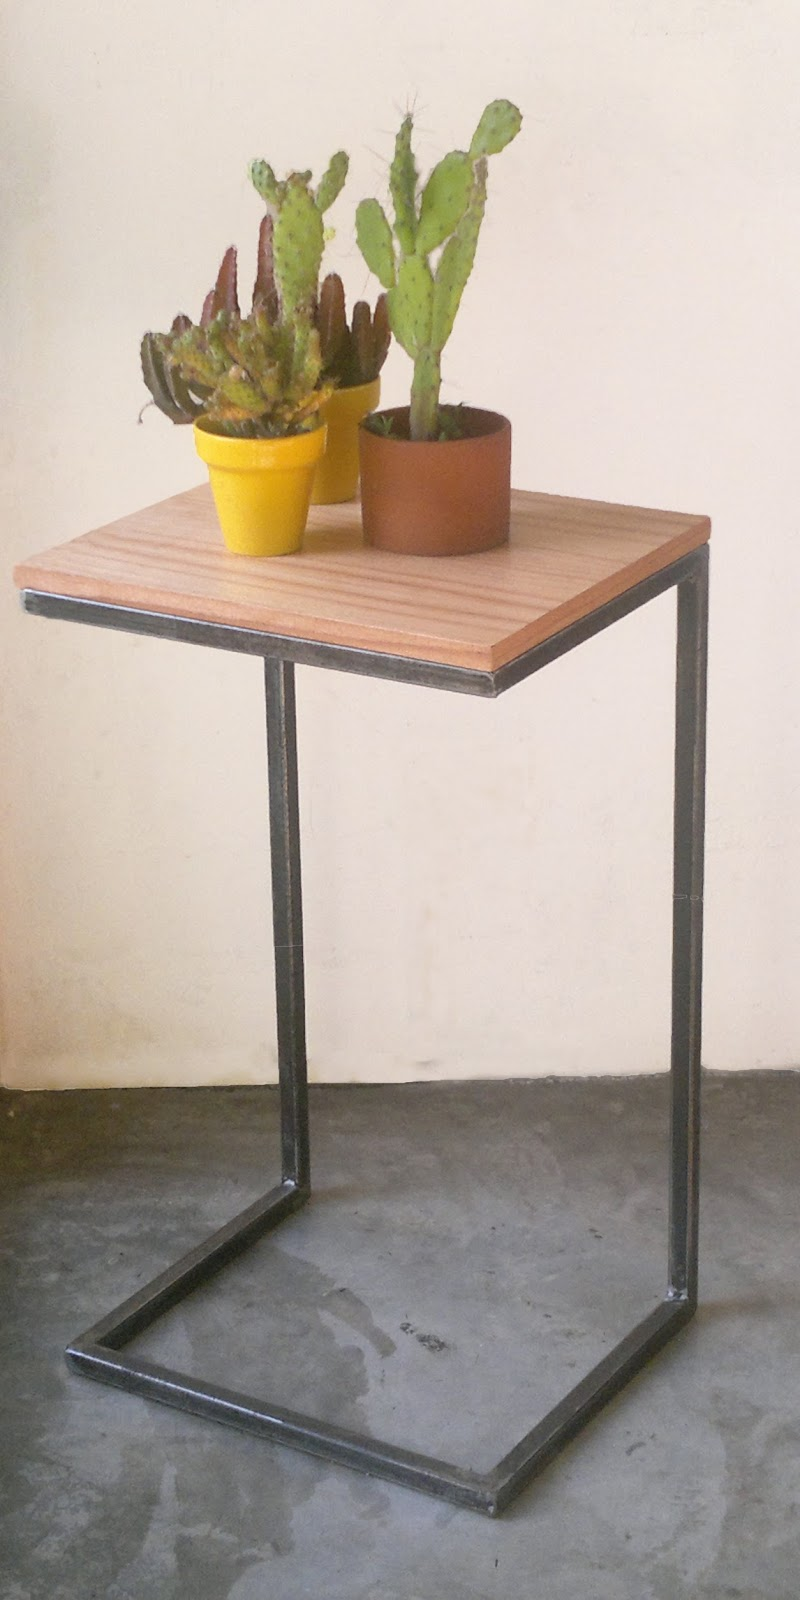 Mesa de arrime hierro y madera. Auxiliar | Trifecta muebles